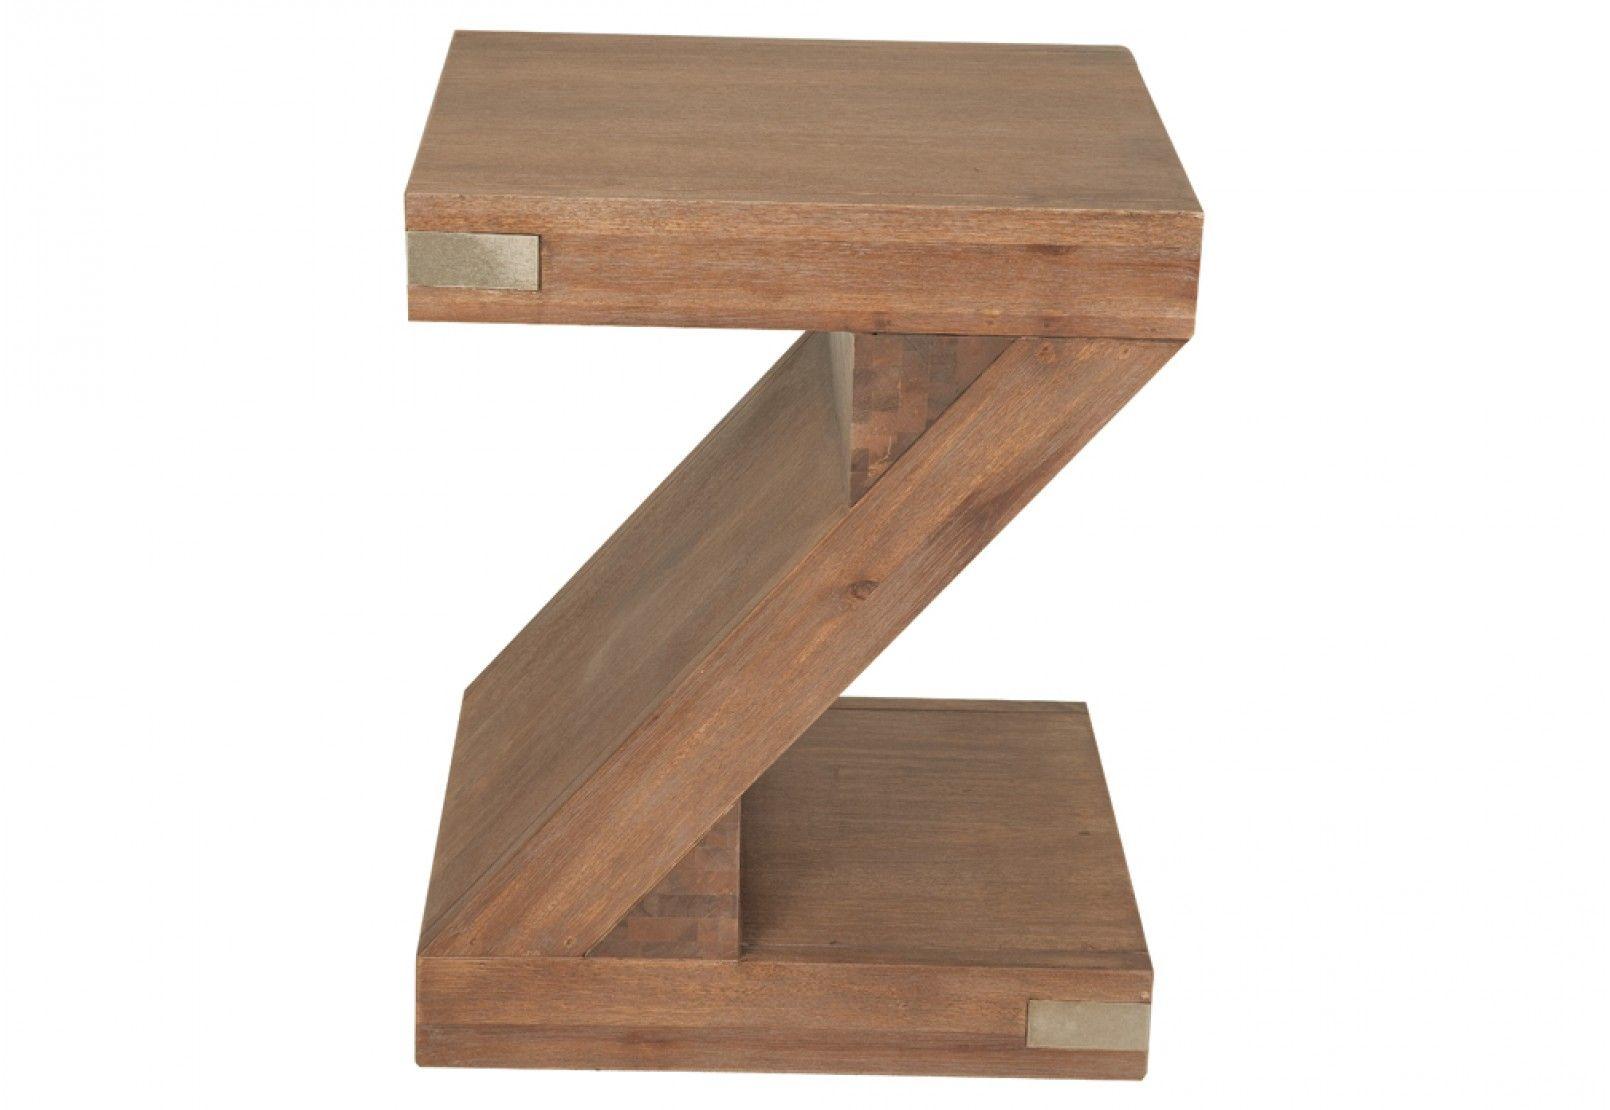 Silverwood z pedestal side table super a mart living room silverwood z pedestal side table super a mart geotapseo Gallery